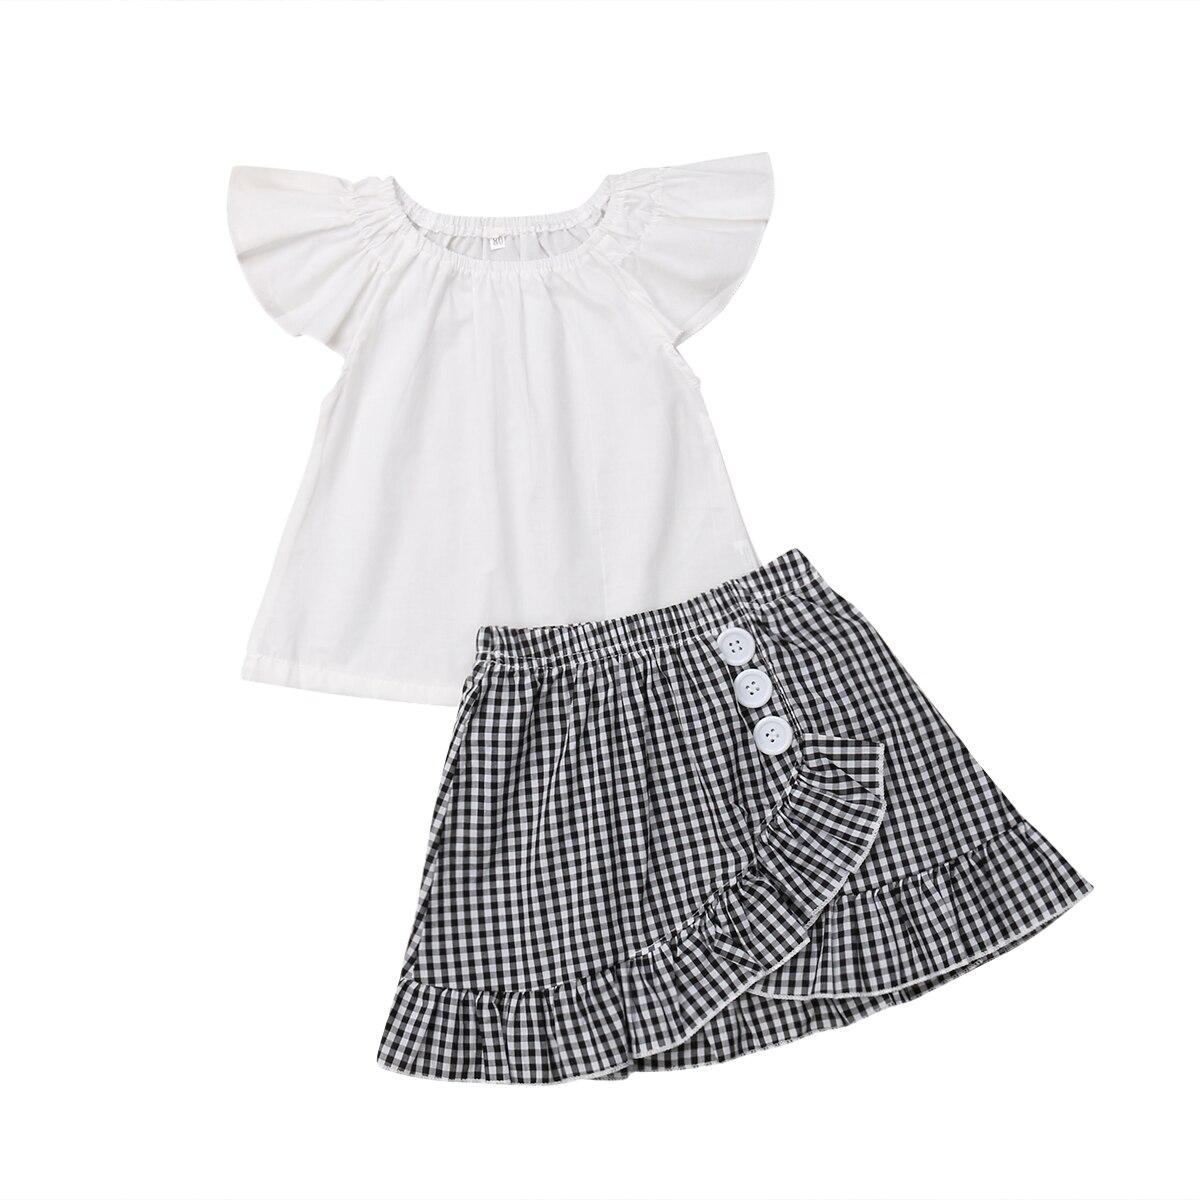 2019 Girls Ruffles Long Sleeve Lace Plaid White T-shirt Tops Wide Leg Pant Trouser 2pcs Outfits Kids Clothing Set1-6t Hot Clothing Sets